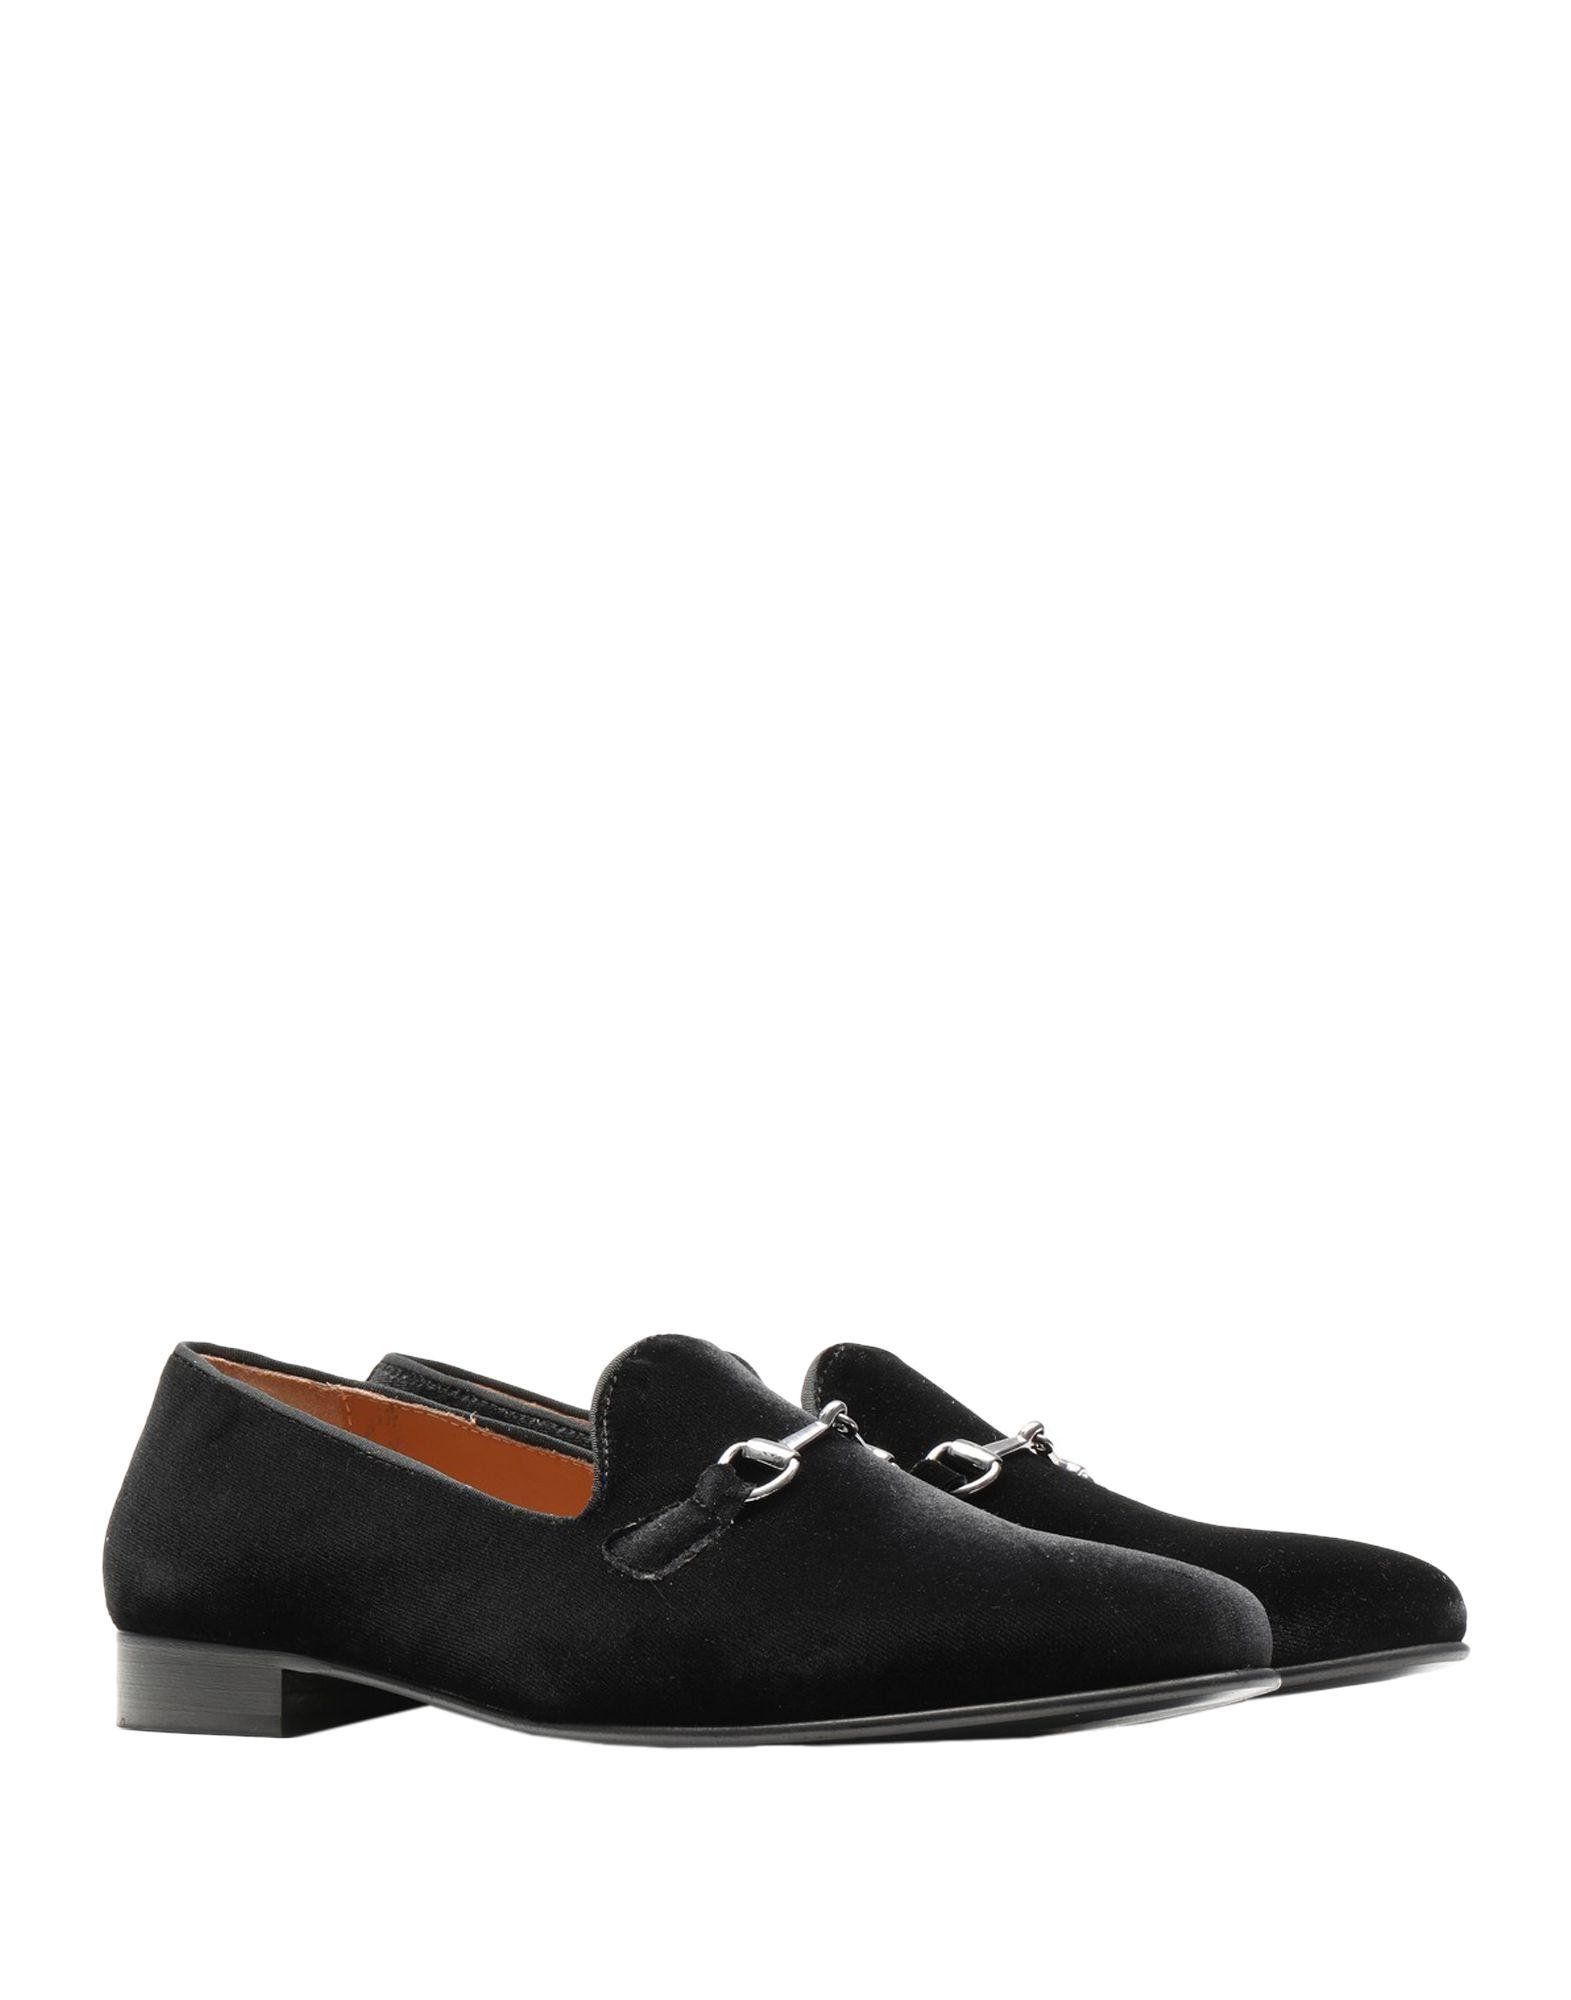 Leonardo Principi Mokassins  Herren  Mokassins 11536595GS Neue Schuhe 7cbe81